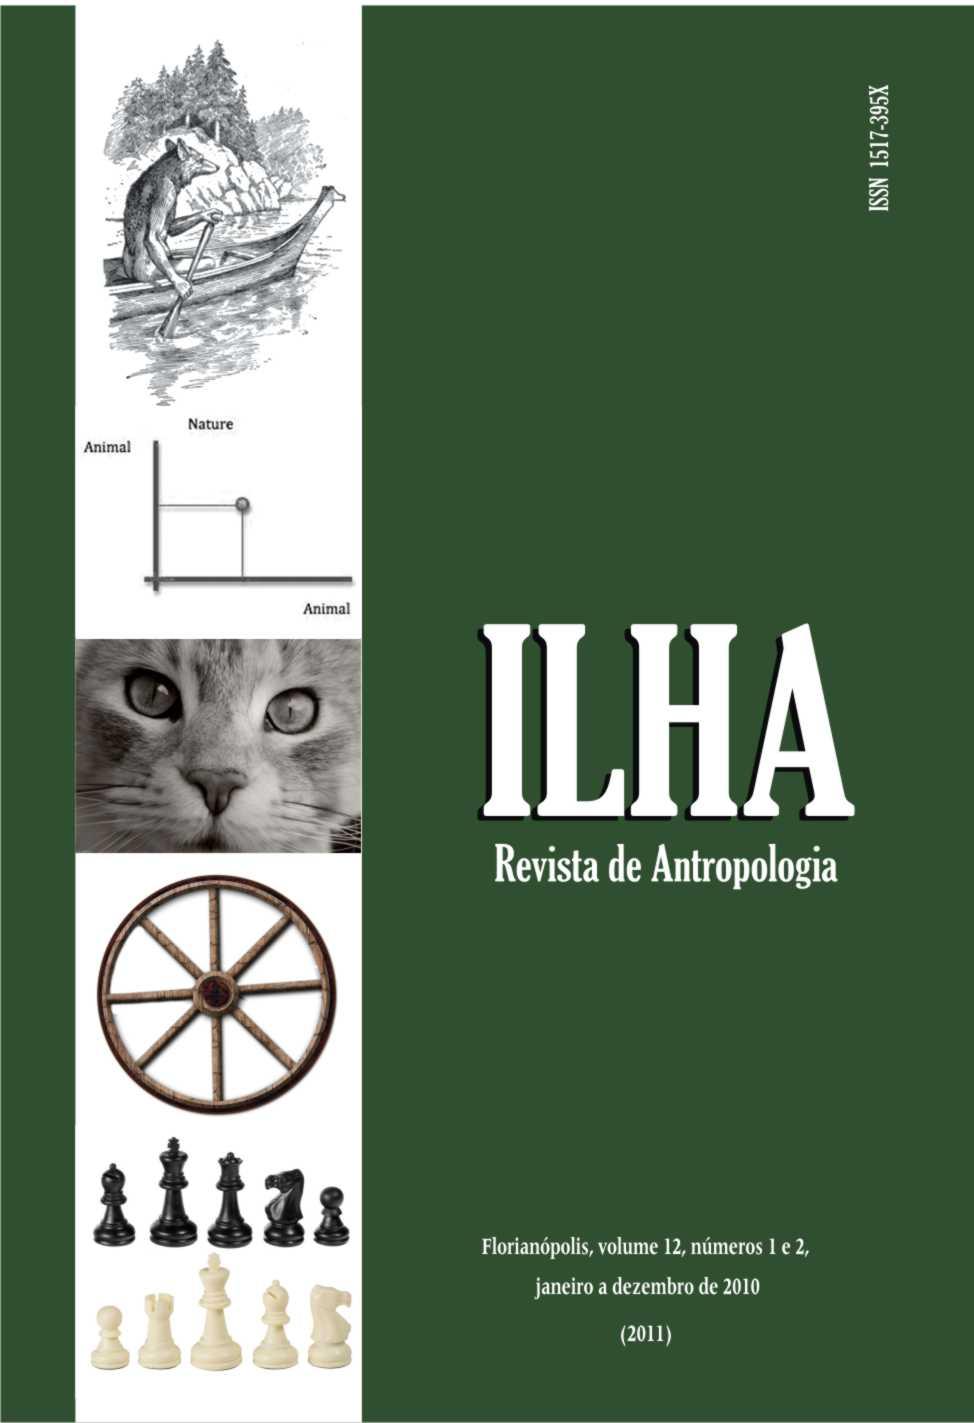 Editora deste volume: Professora Doutora Vânia Zikán Cardoso